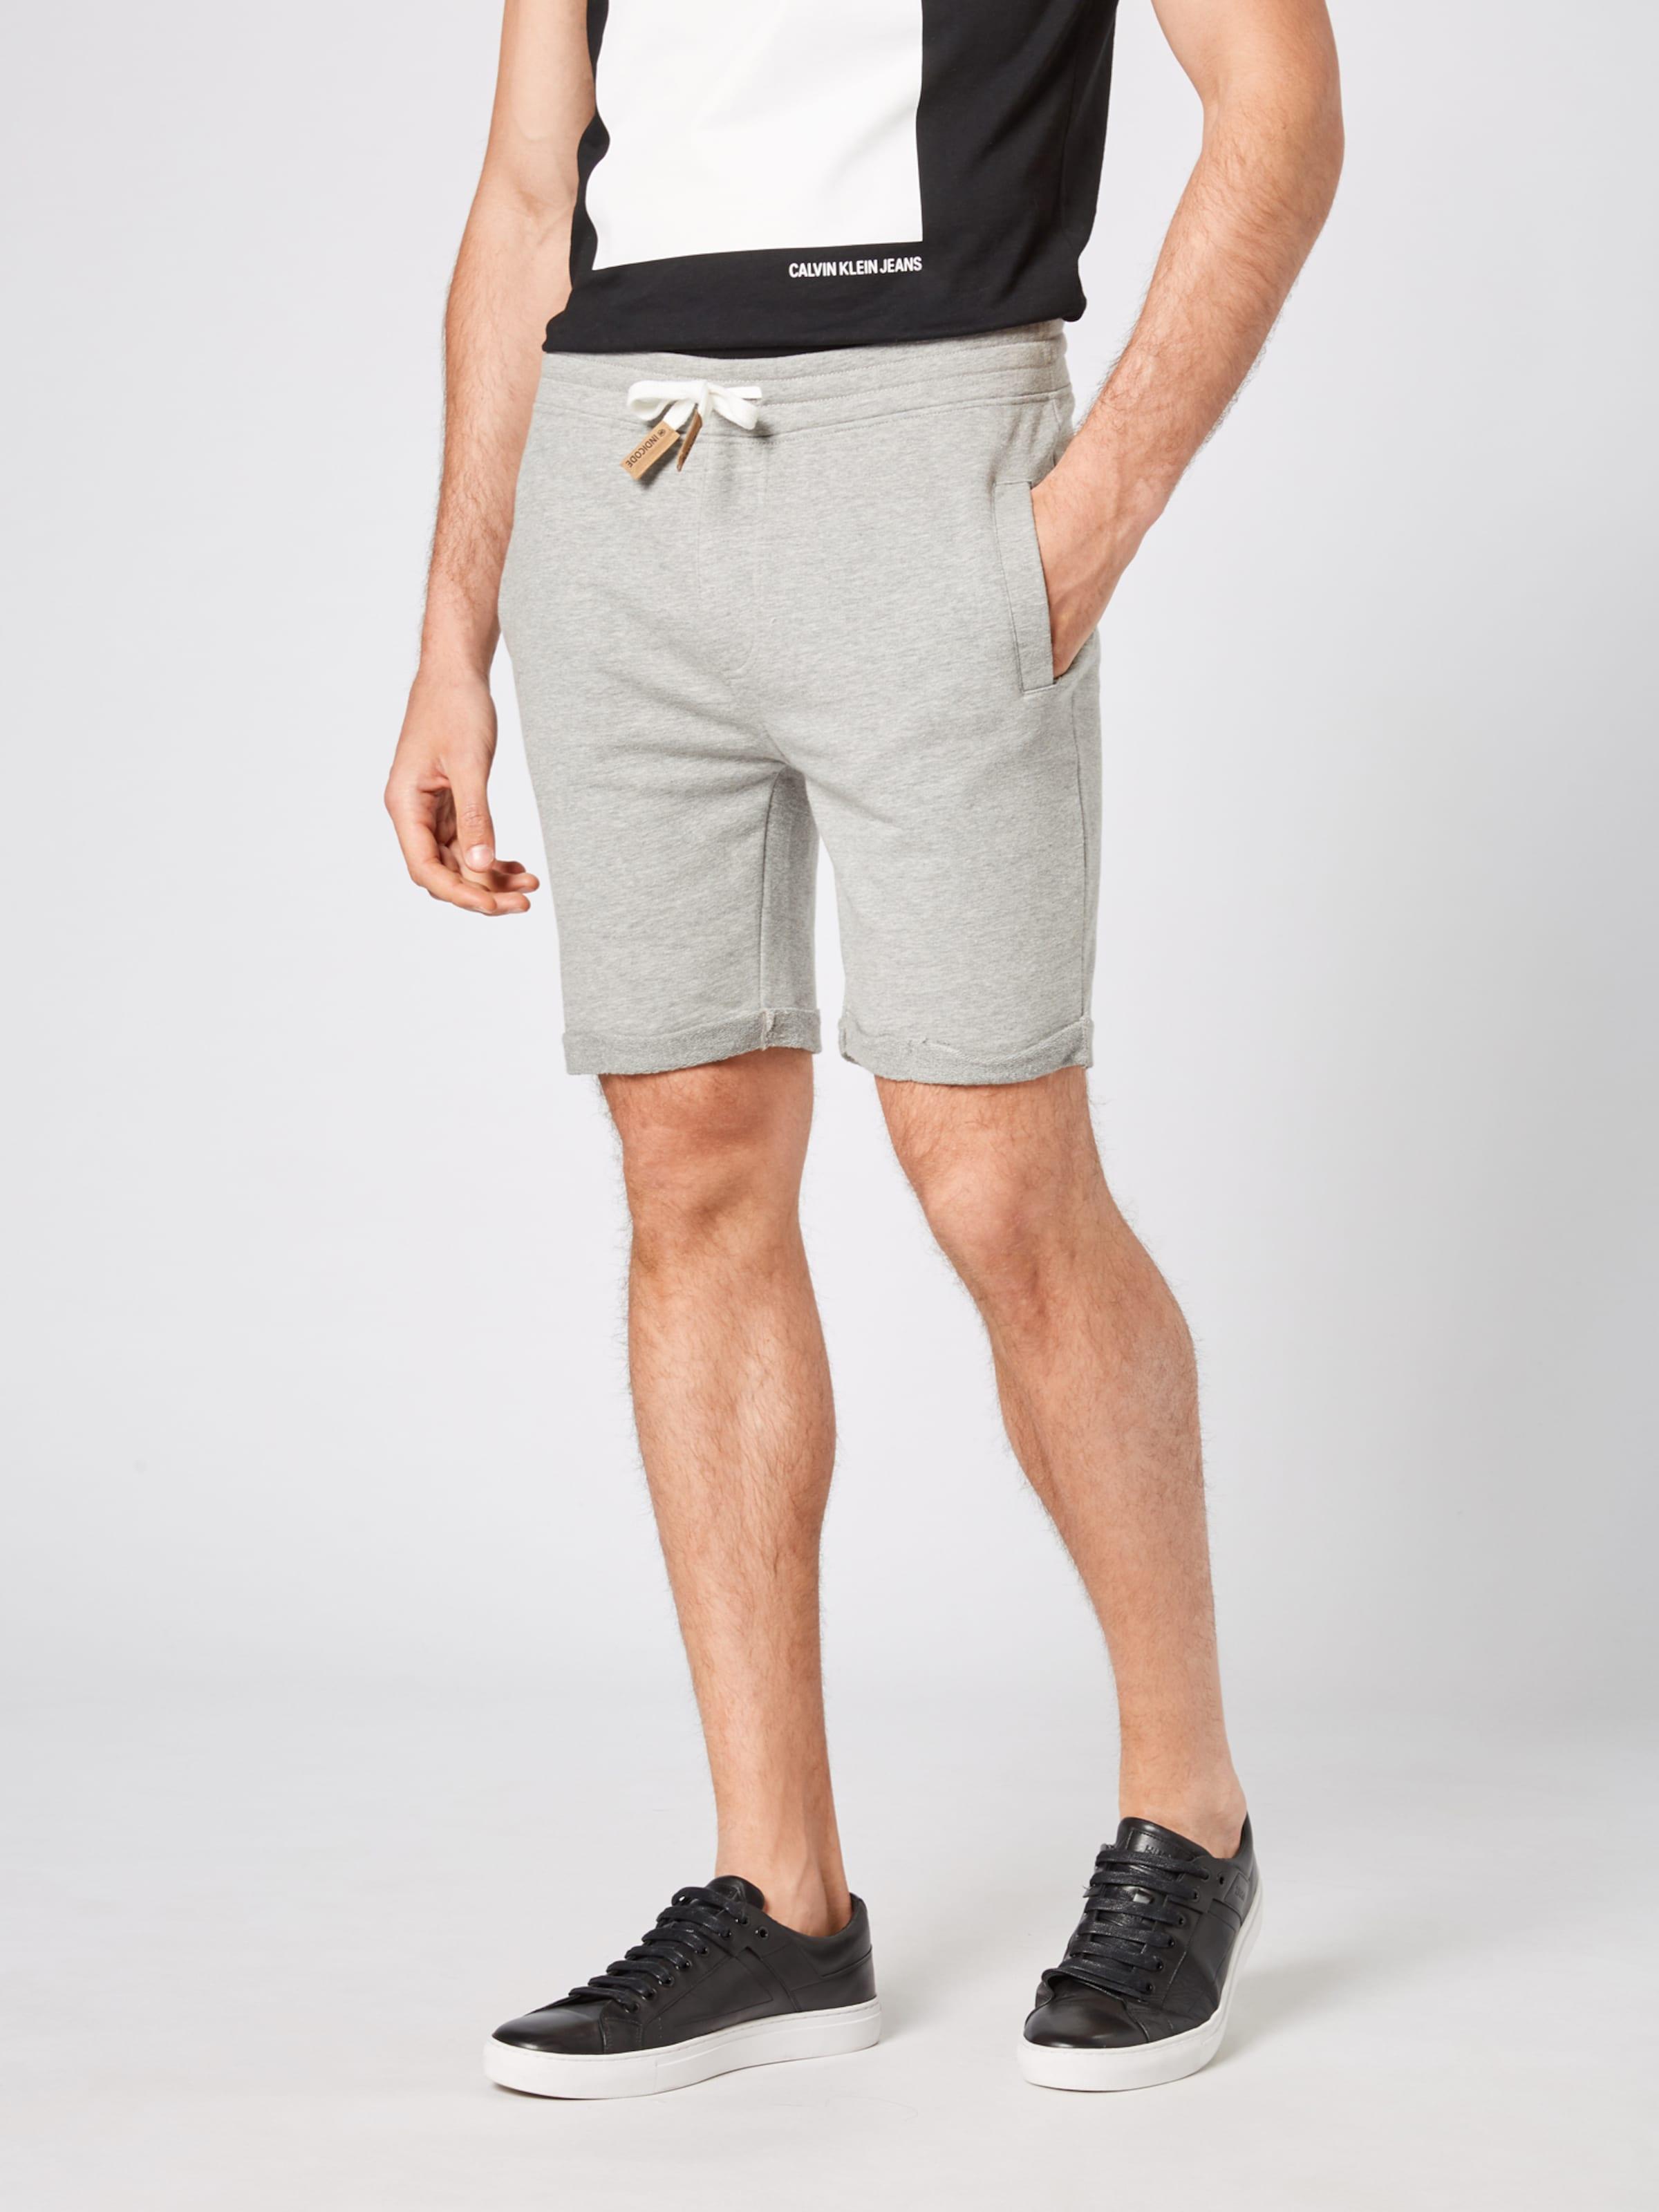 Jeans 'rion' Shorts Indicode Grau In R43A5Lj